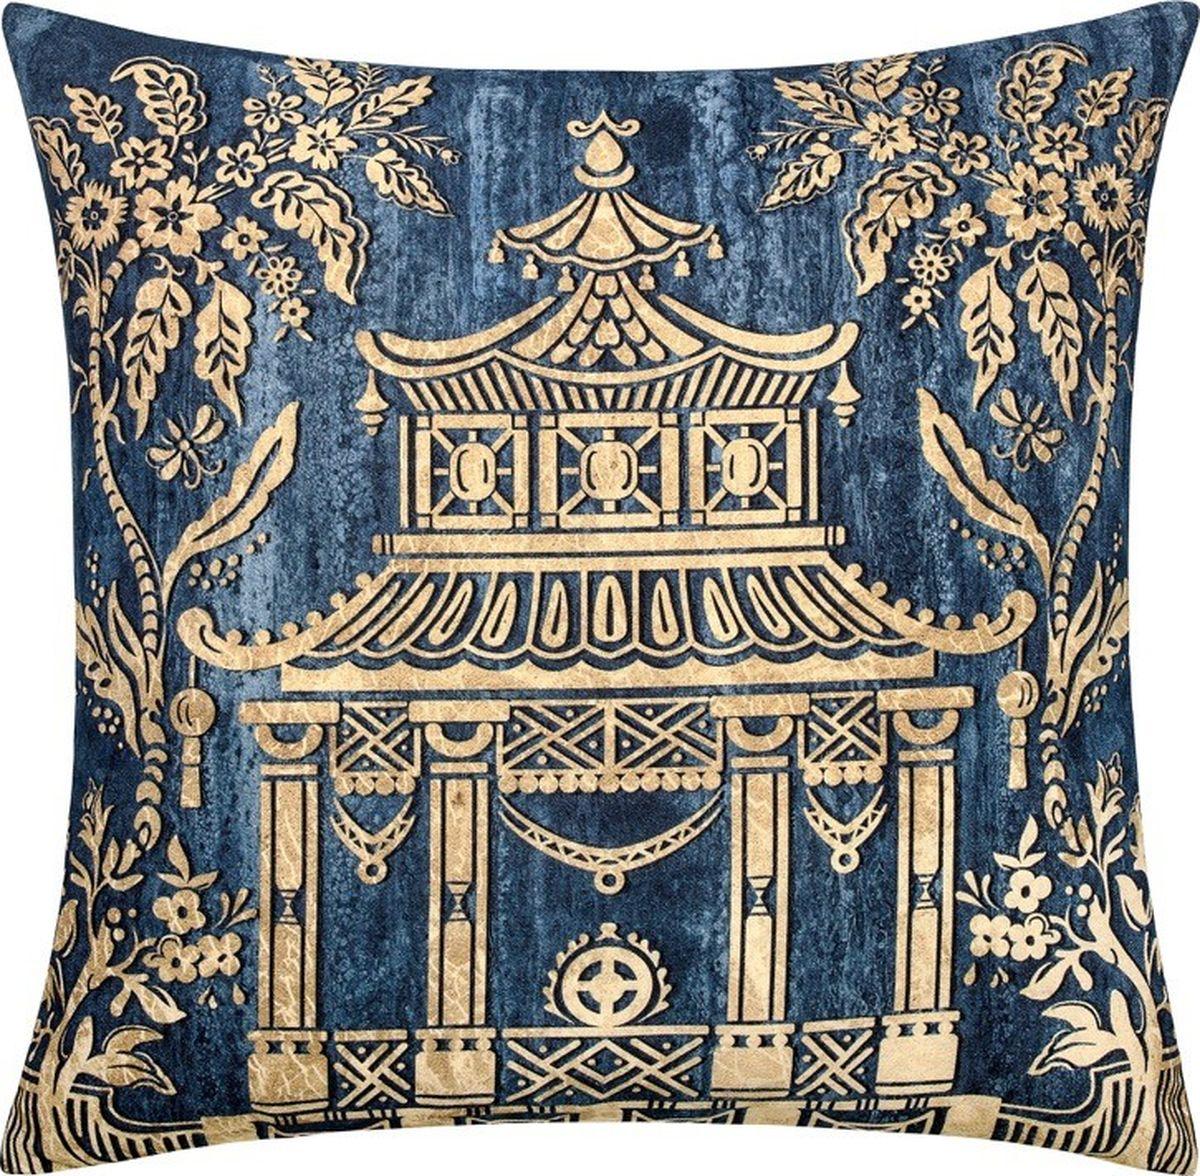 Подушка декоративная Togas Пагода, 45 х 45 см40.16.70.0270